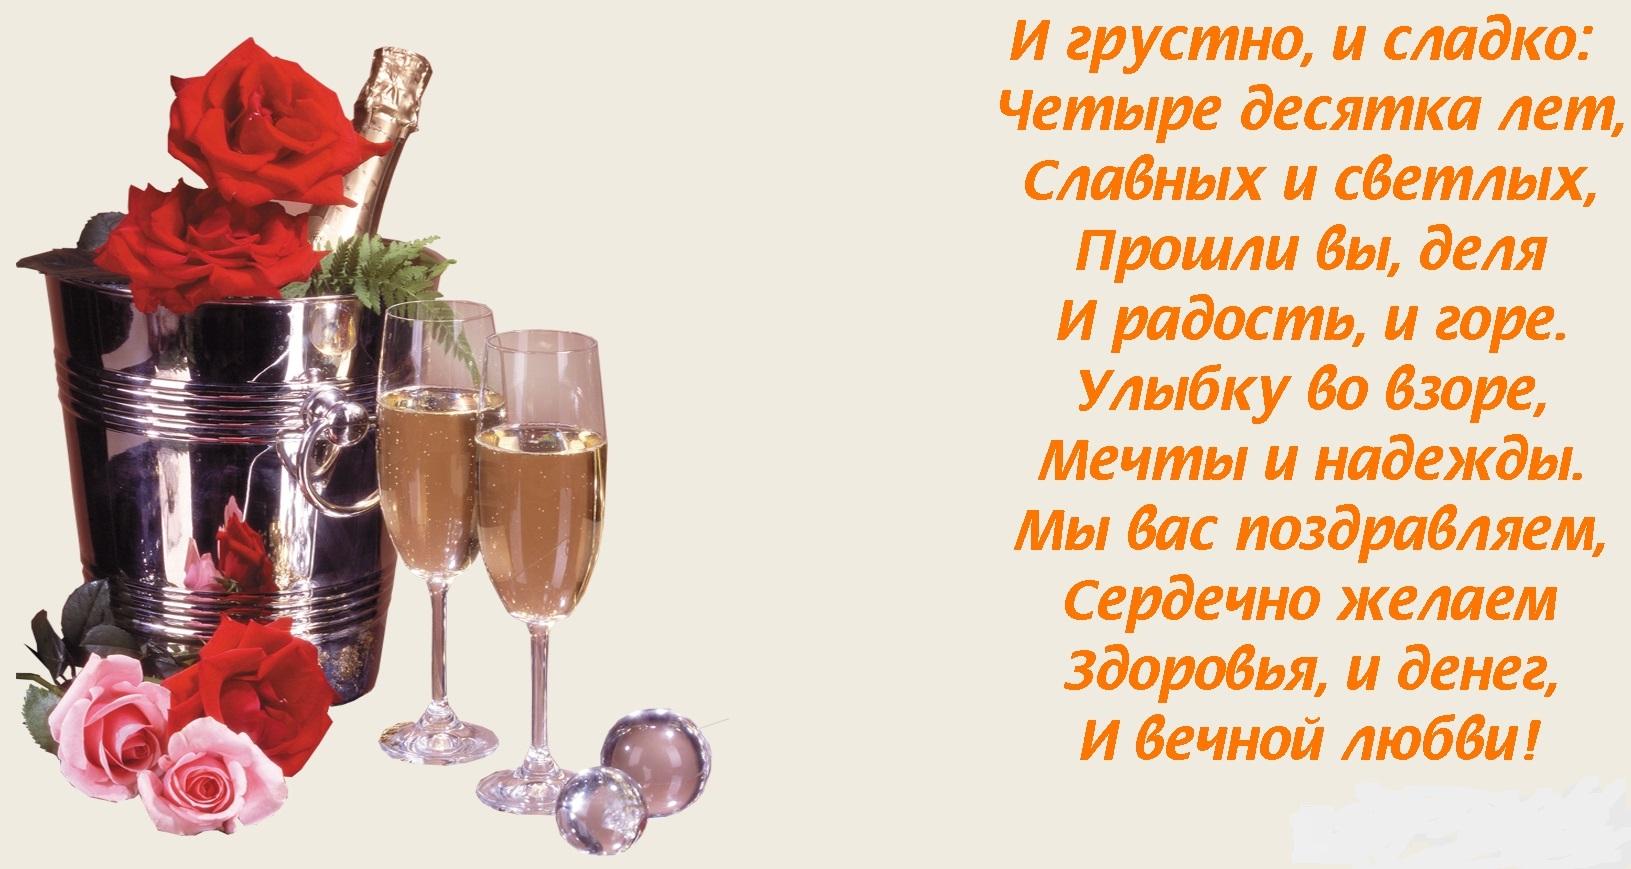 Клубничная/каменная свадьба (33 года) какая свадьба 20